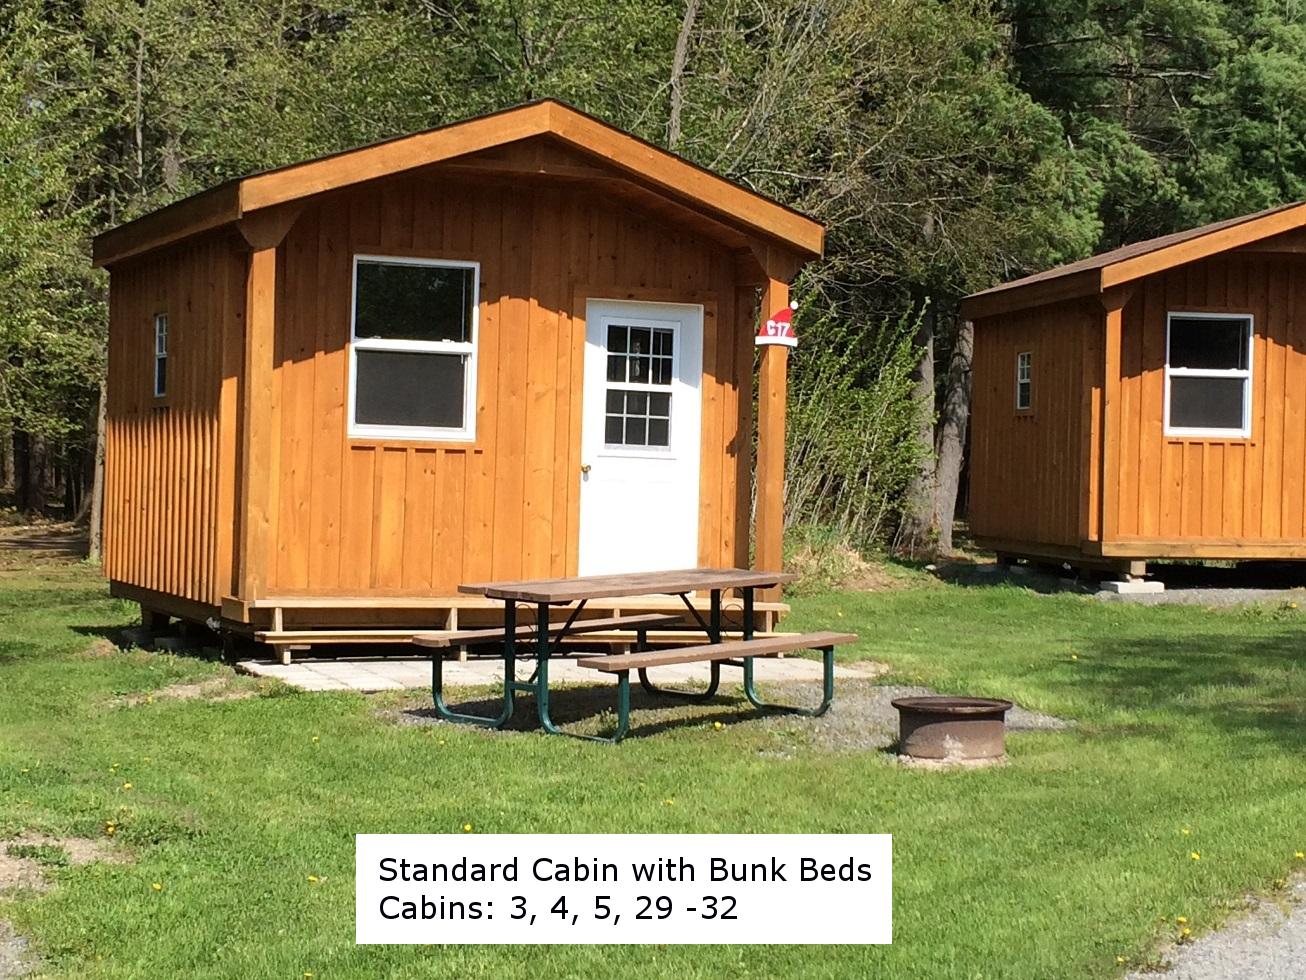 Cottages, Cabins & Yurts | Santa's Village Campground